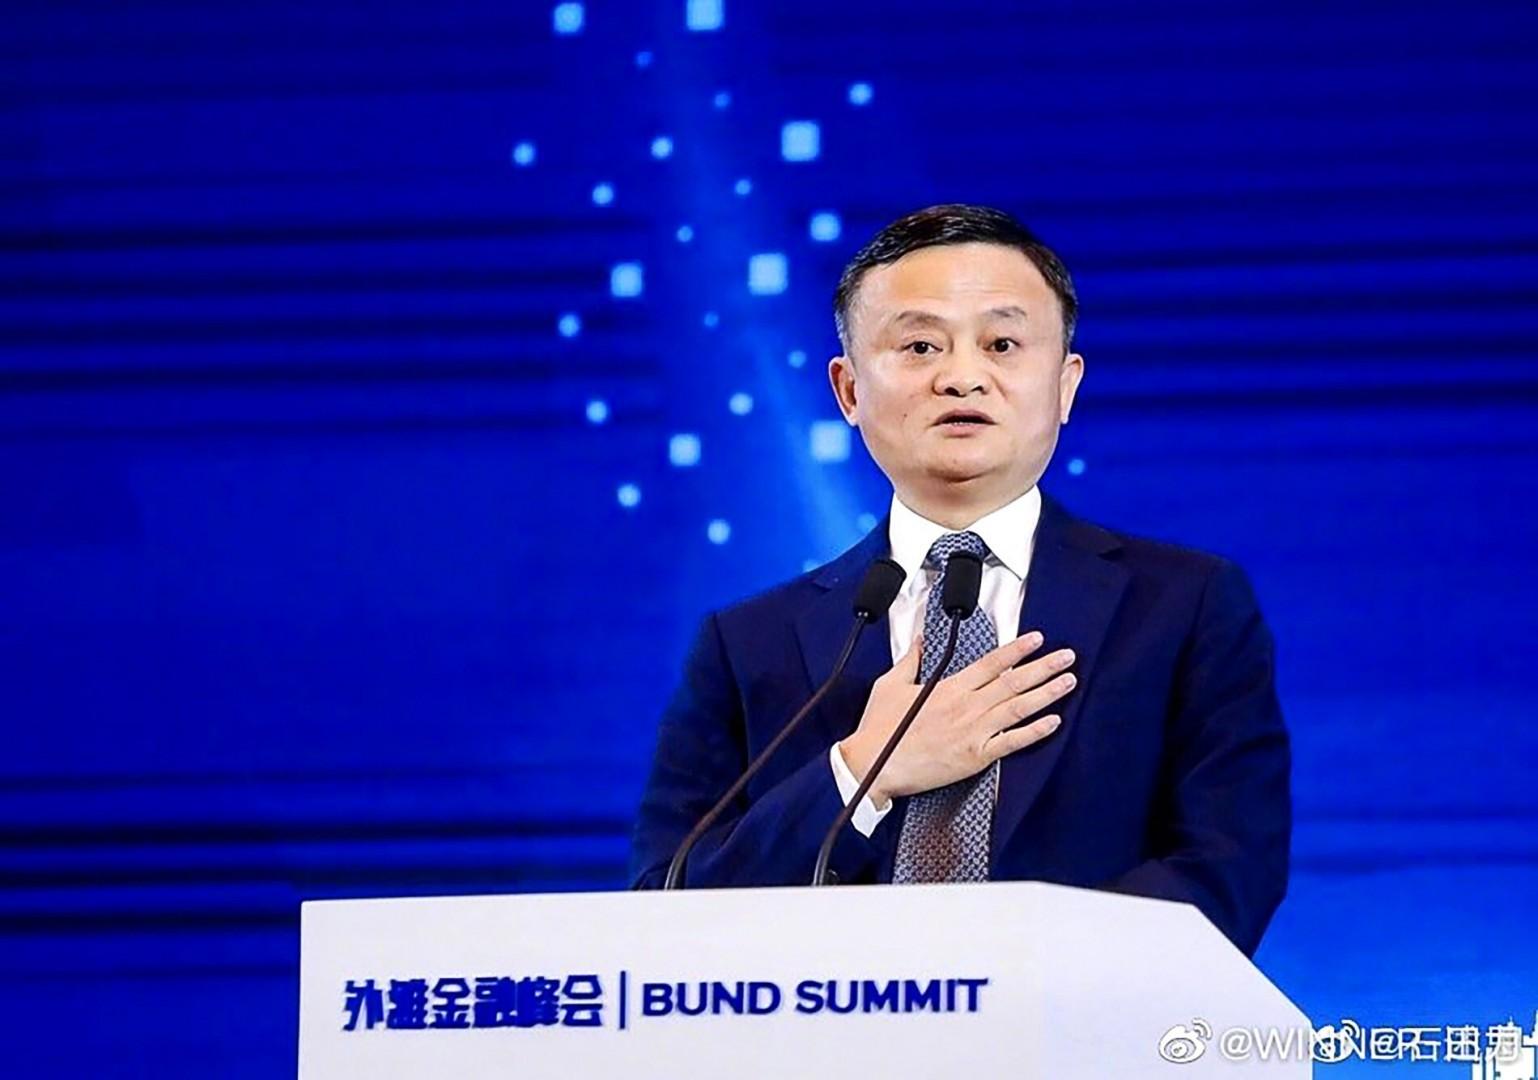 Jack Ma at the Bund Summit.